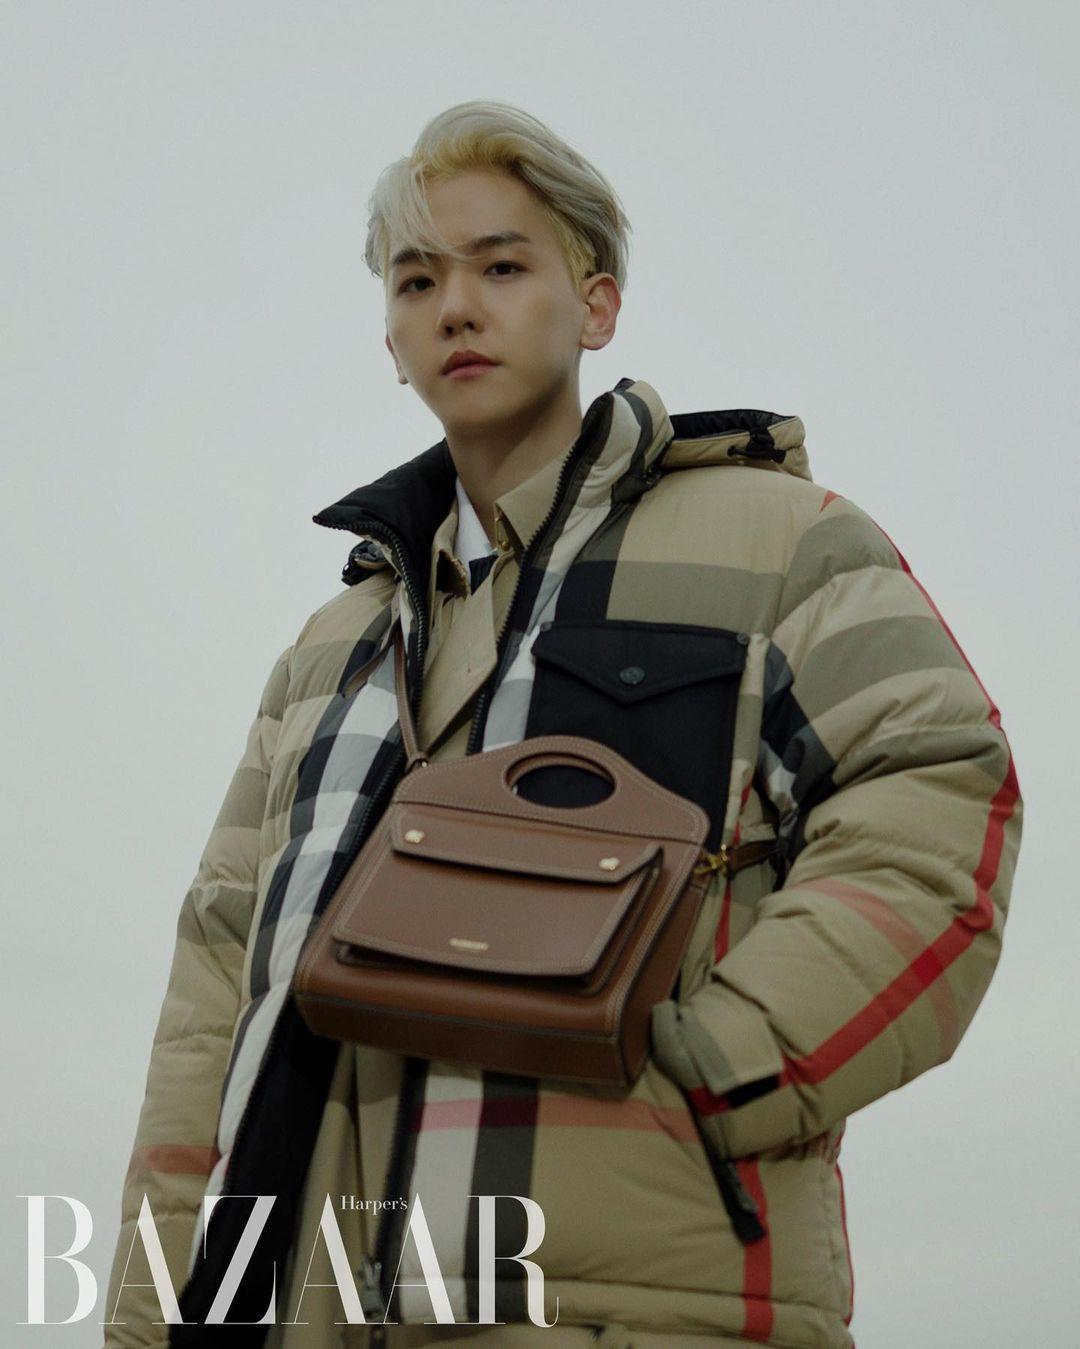 Baekhyun x Burberry For Harper's BAZAAR Korea: omonatheydidnt — LiveJournal